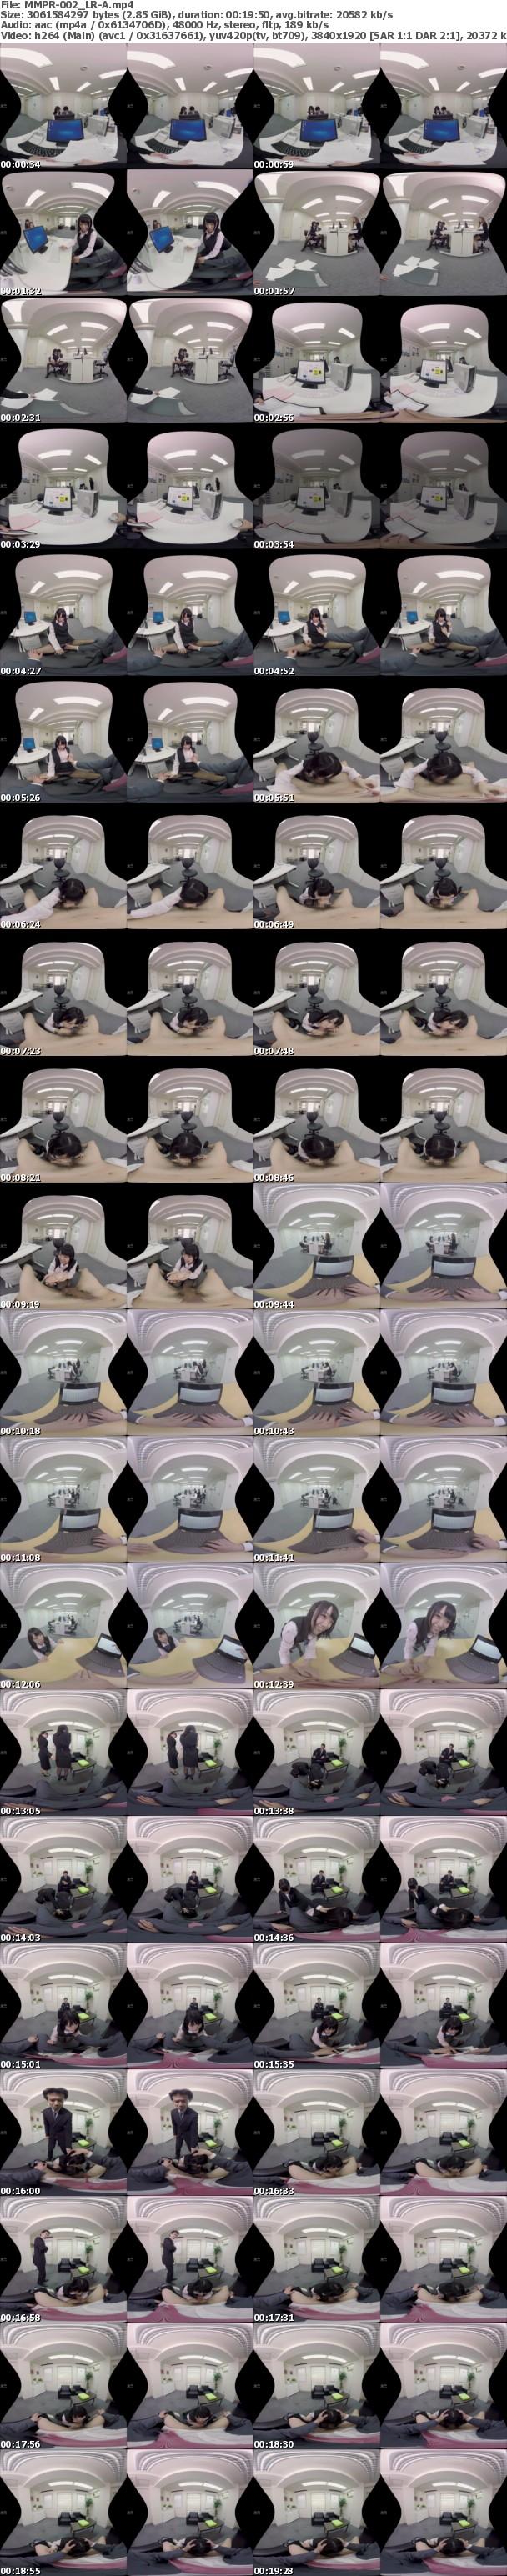 (VR) MMPR-002【超高画質30fps】ゆるかわダメOLひまわりちゃん 夏乃ひまわり